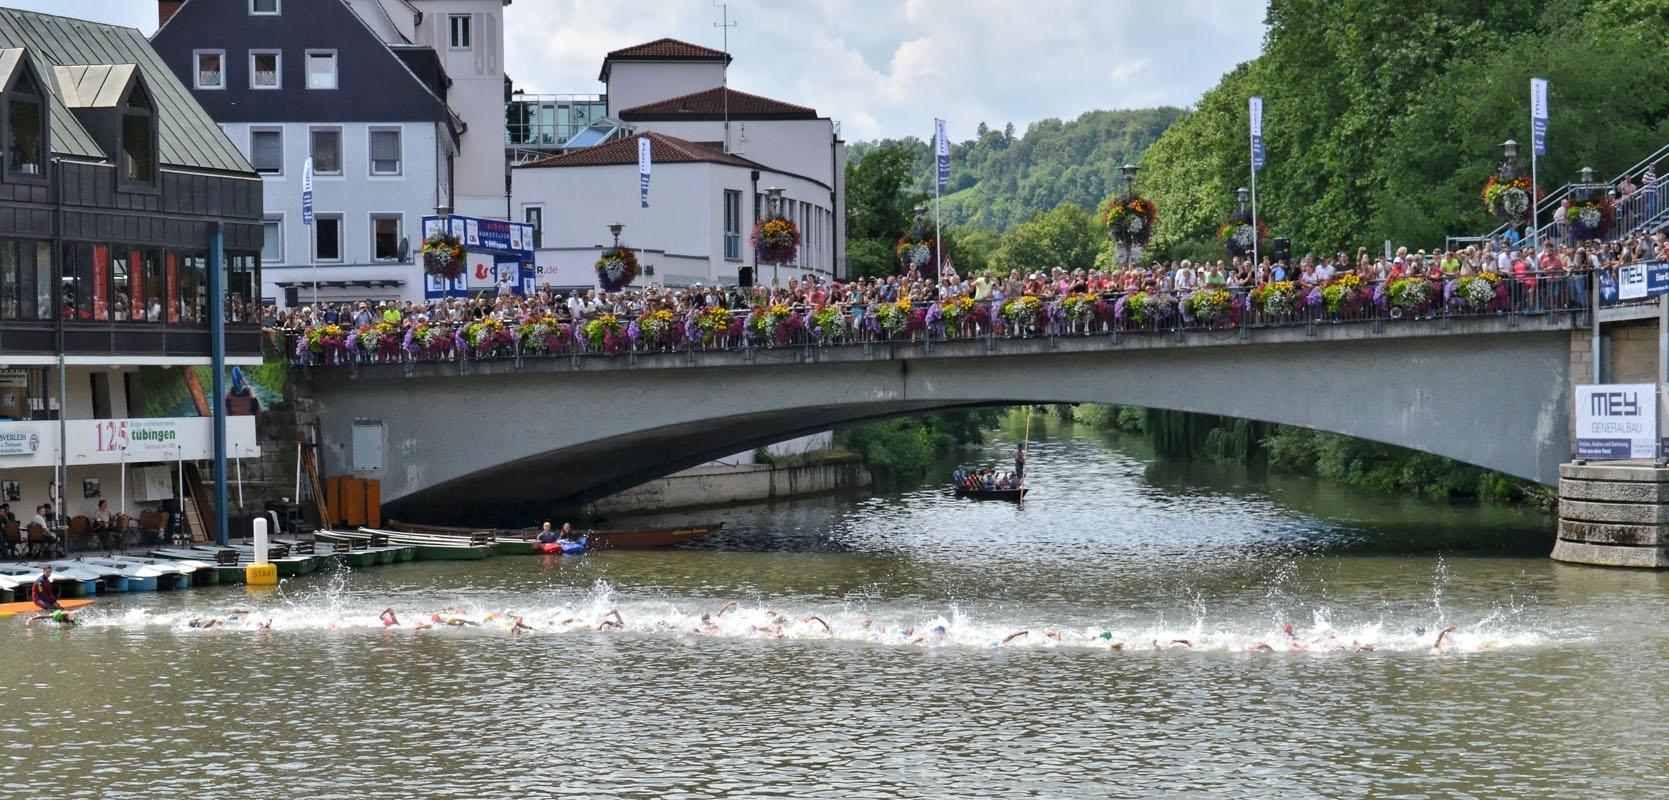 TuS Neukölln Berlin » Finale der 1. Triathlon-Bundesliga am 24.7. in ...